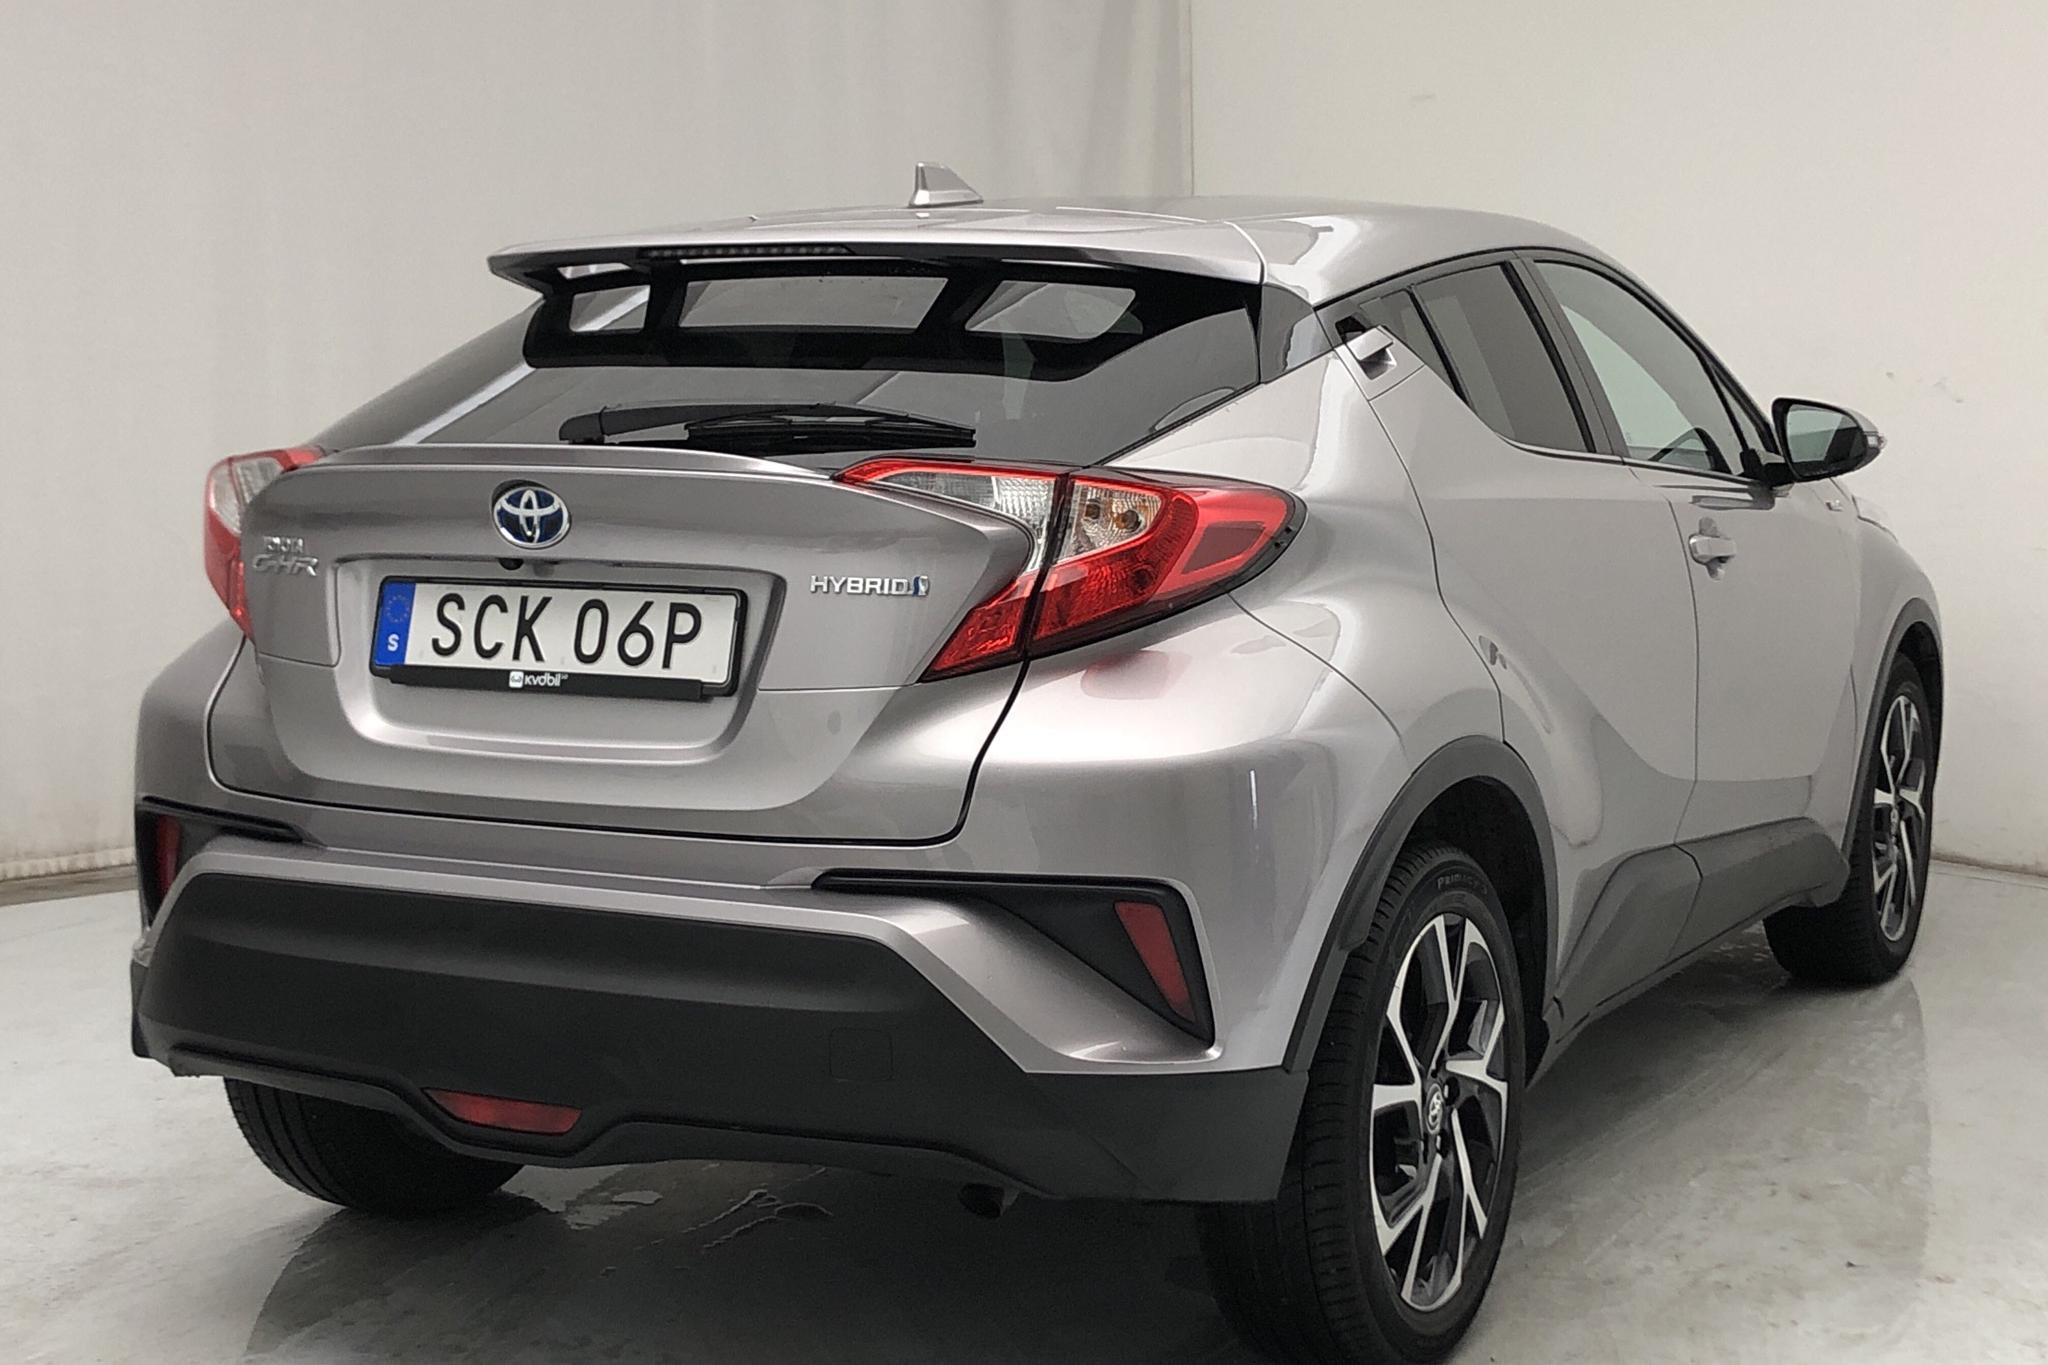 Toyota C-HR 1.8 HSD (122hk) - 27 960 km - Automatic - Dark Grey - 2019